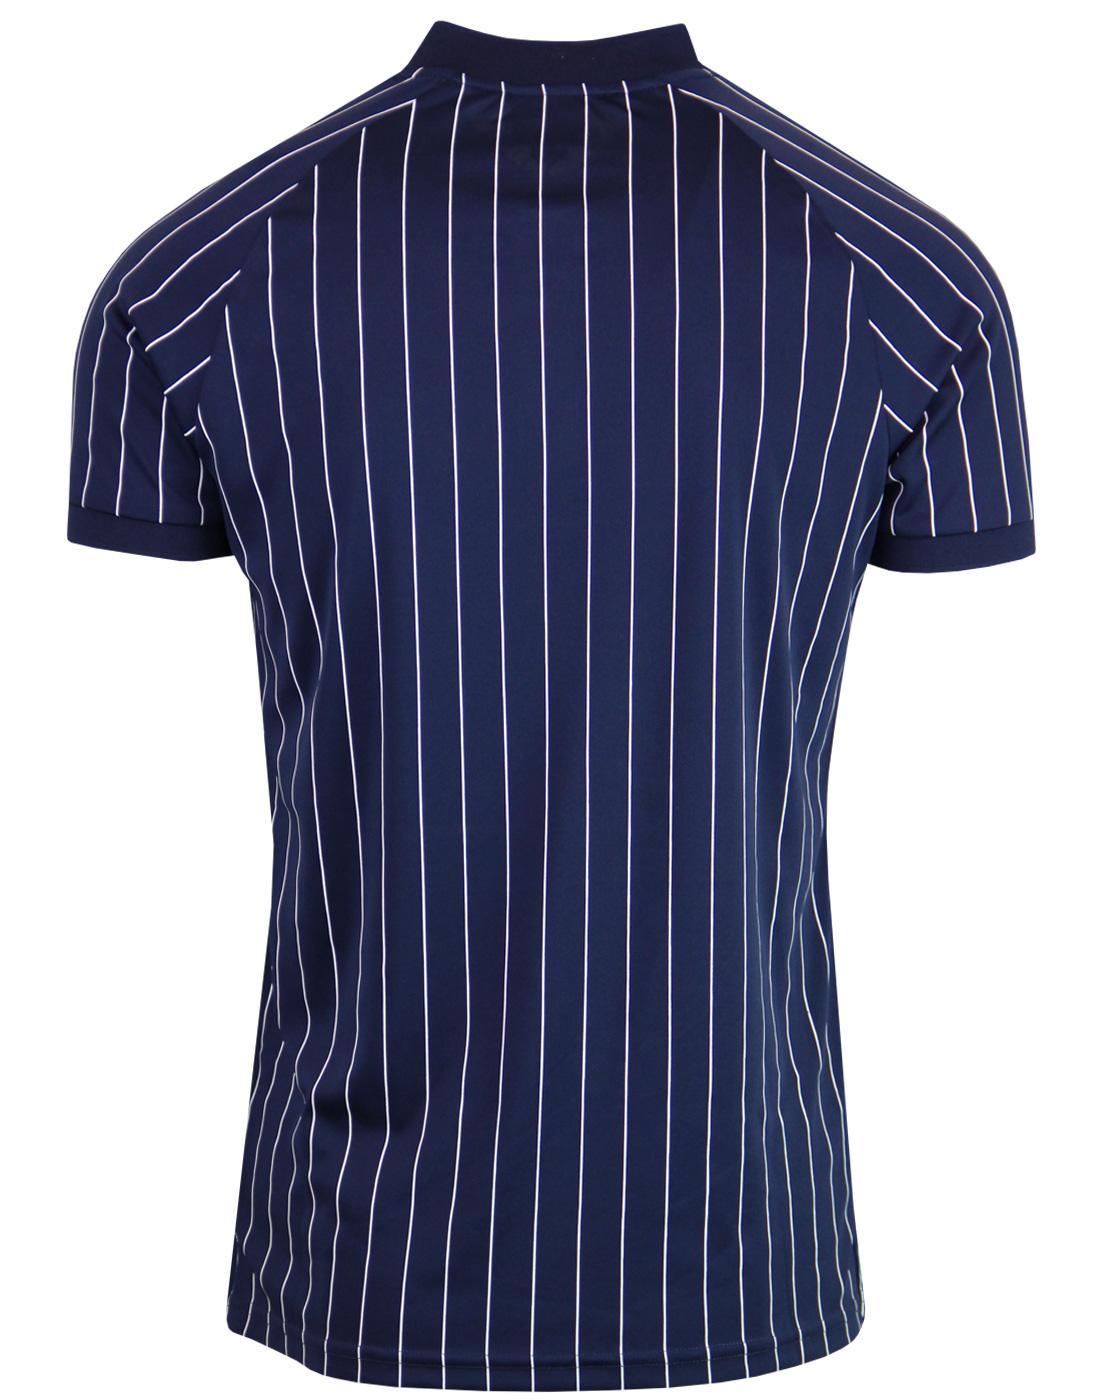 b77bfac1 Ellesse Polo T Shirt Dress - Nils Stucki Kieferorthopäde